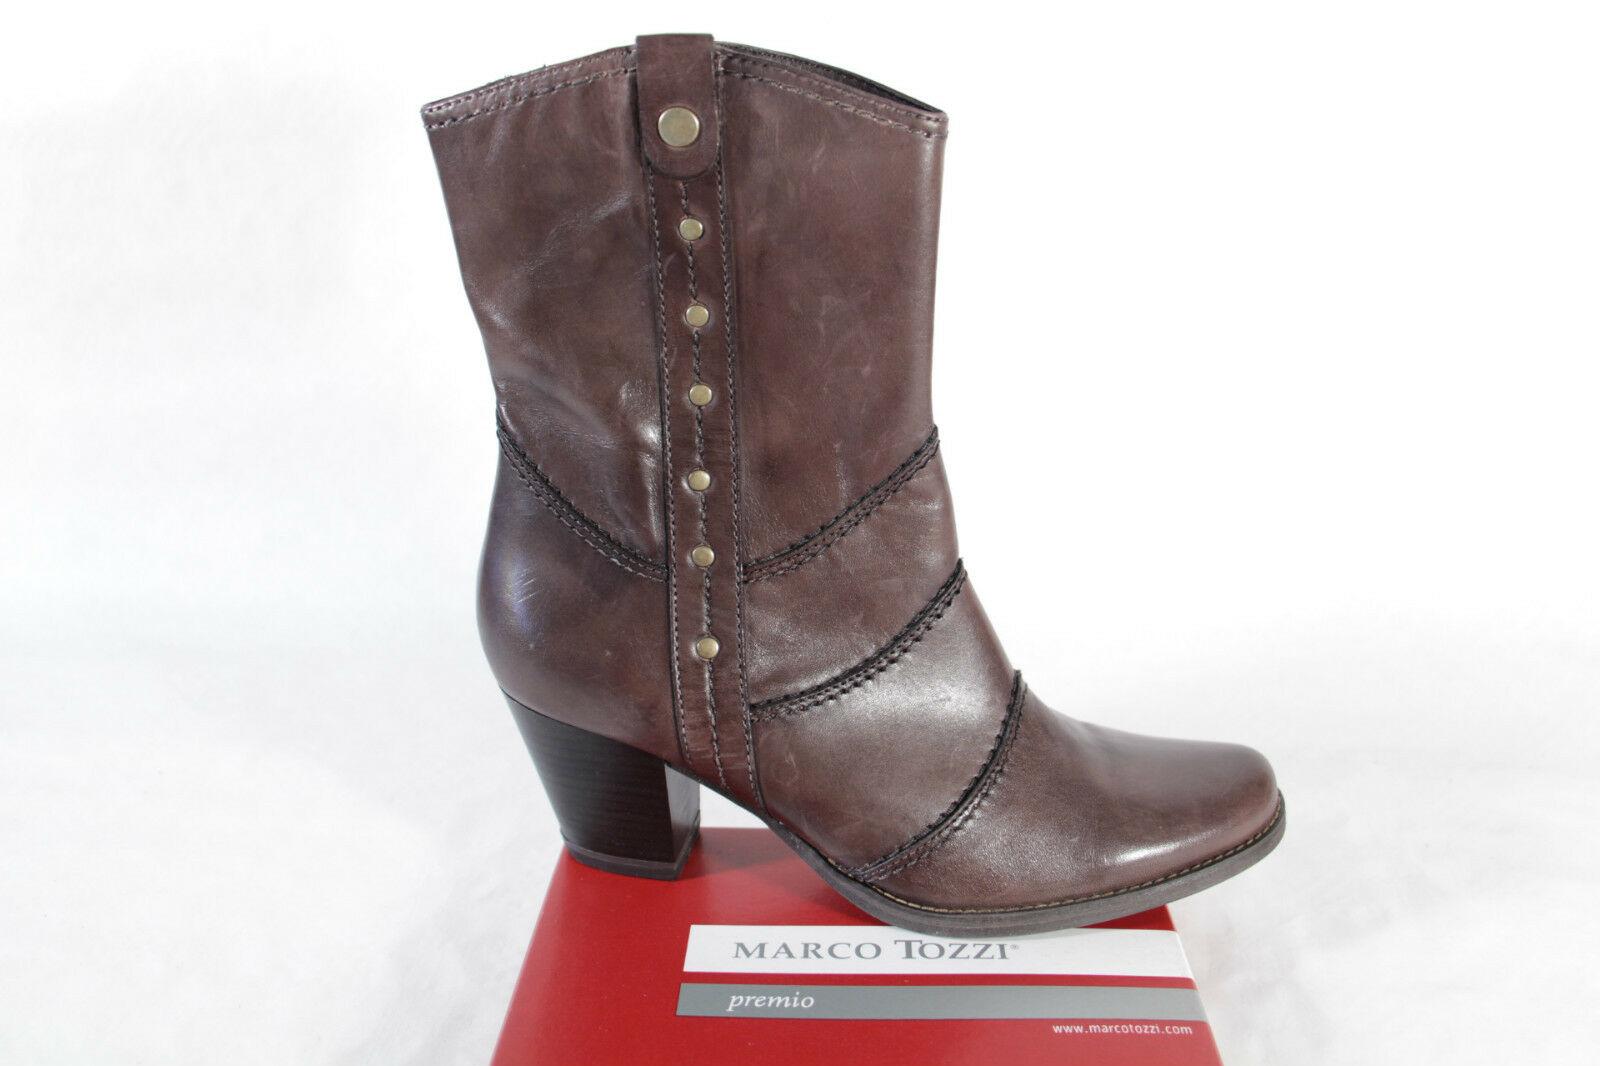 sports shoes 59094 c1505 Marco Tozzi Stiefel Stiefelette Stiefeletten braun Leder RV NEU!! SP. 39,  00 €